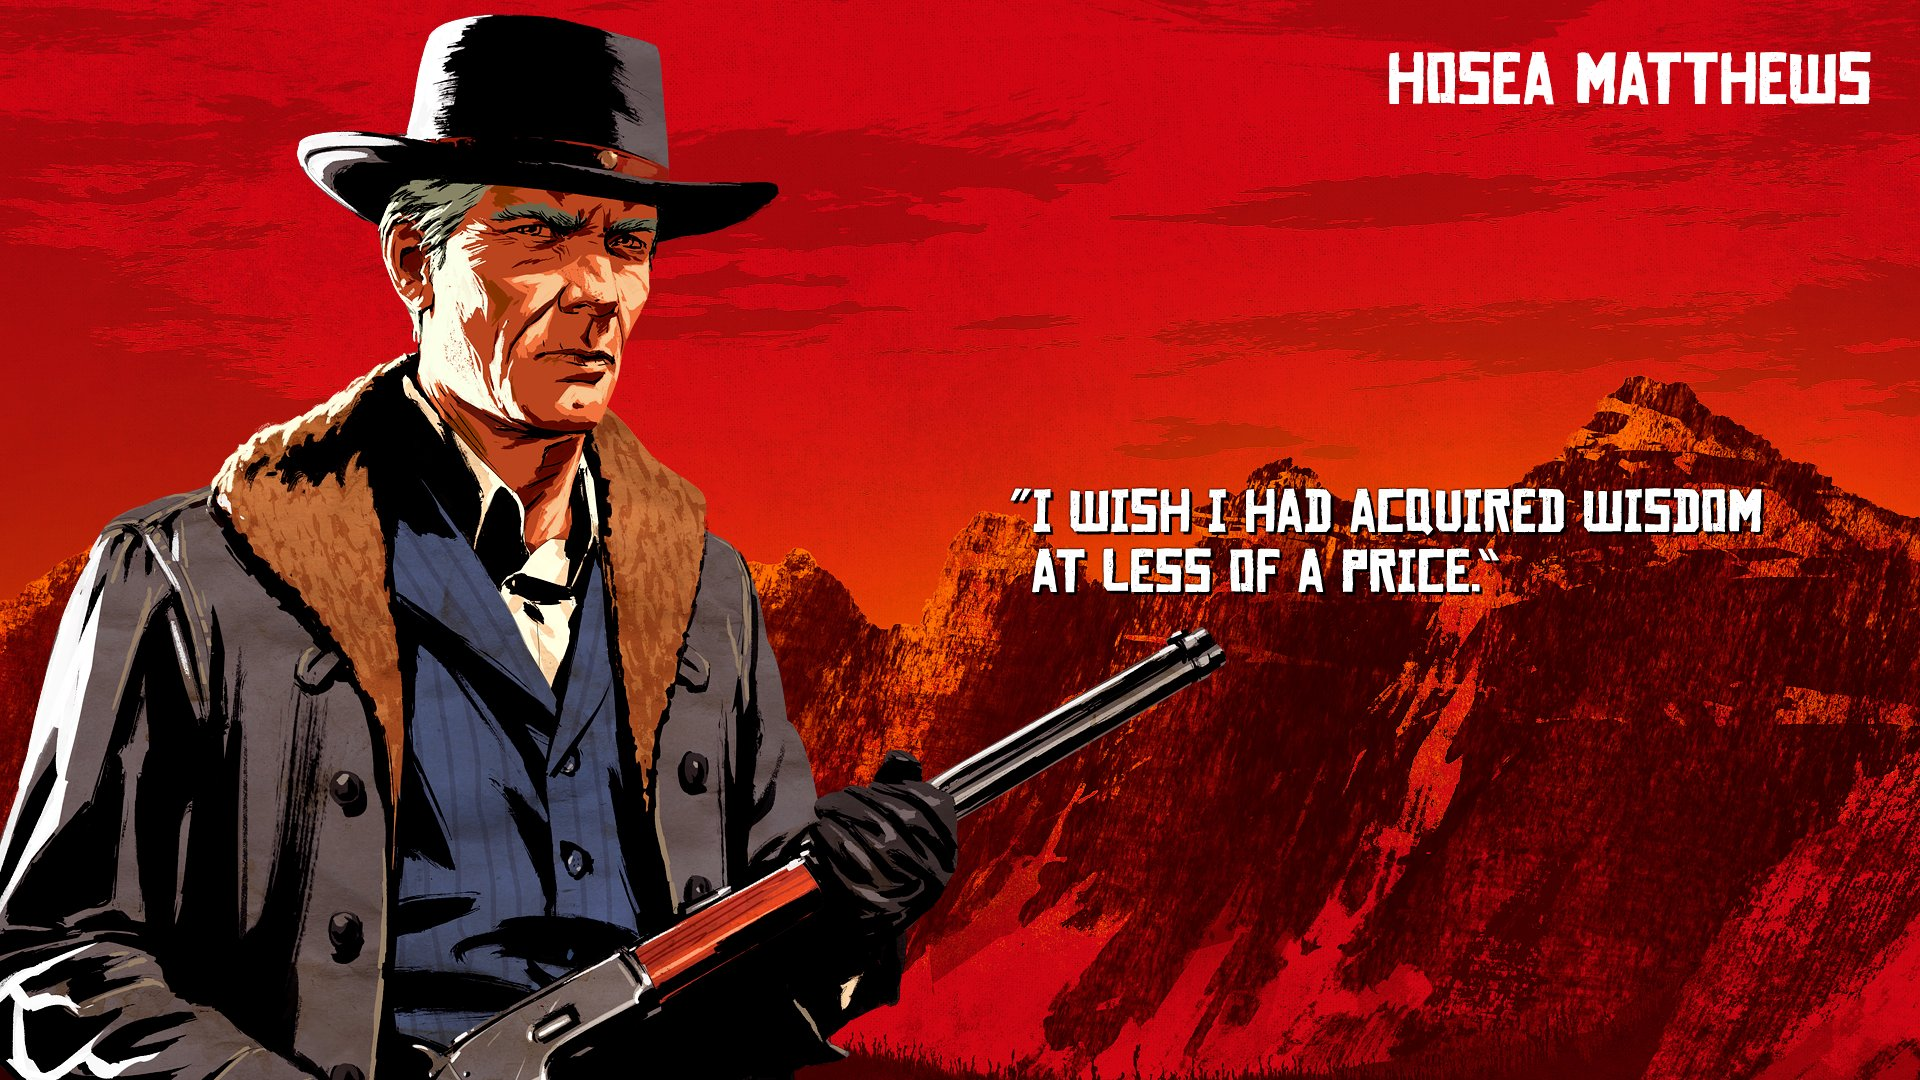 Rockstar Games revela artes dos personagens de Red Dead Redemption 2; veja 7